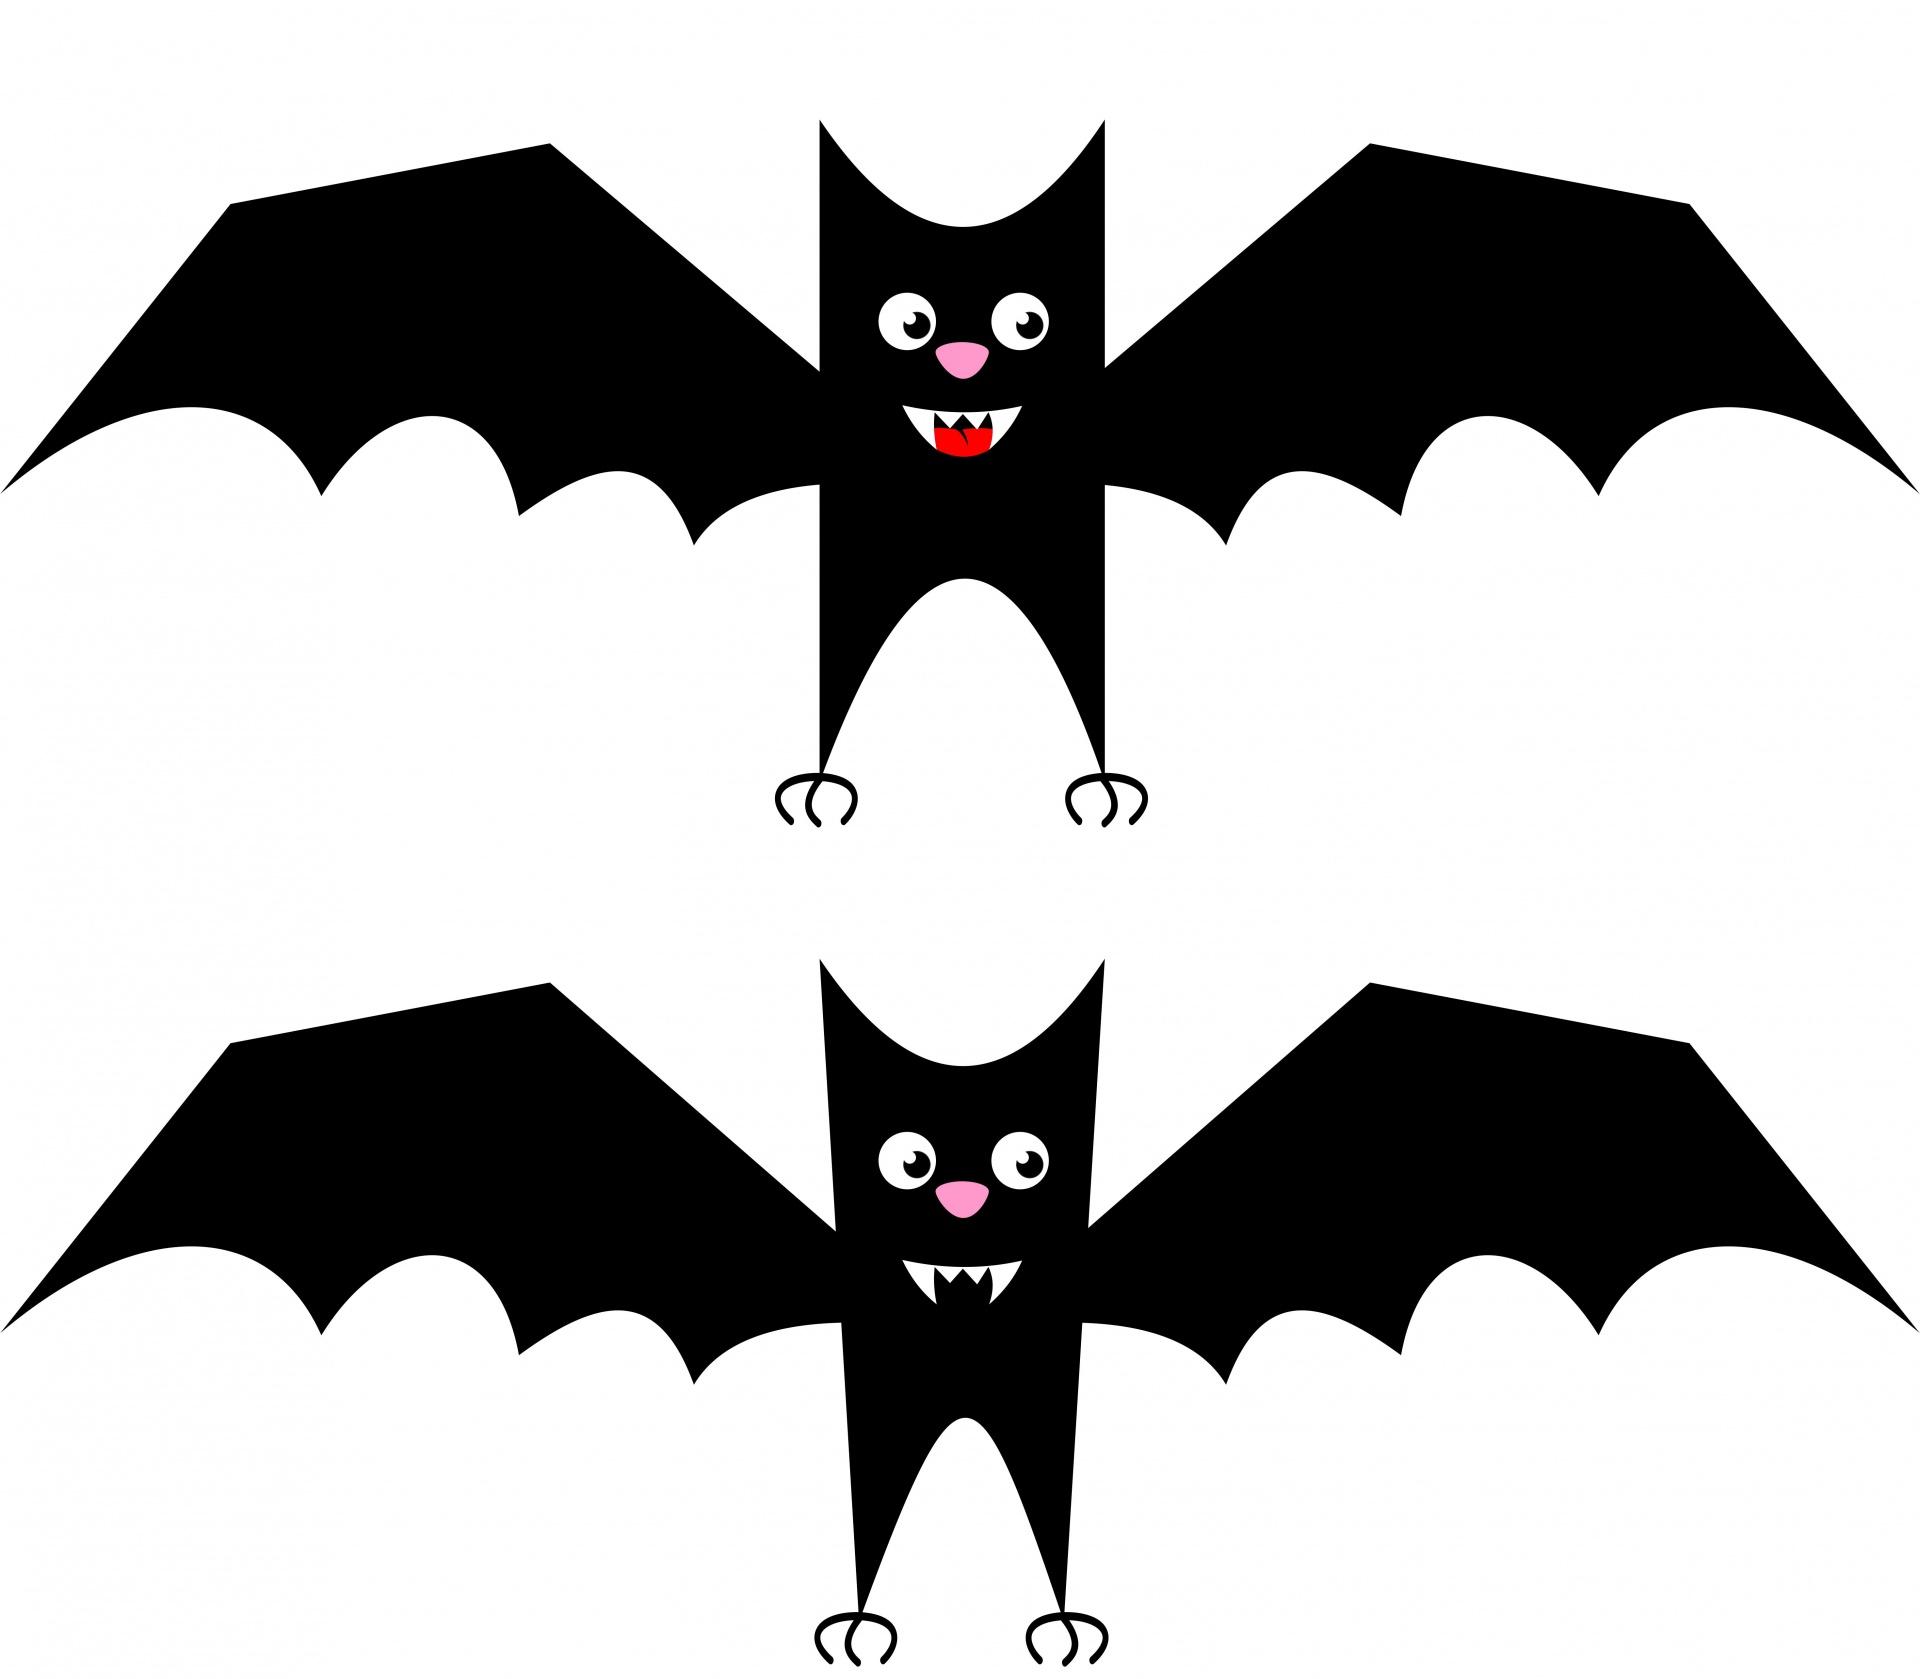 A Picture Of A Cartoon Bat bat,mammal,halloween,spooky,animal - free image from needpix